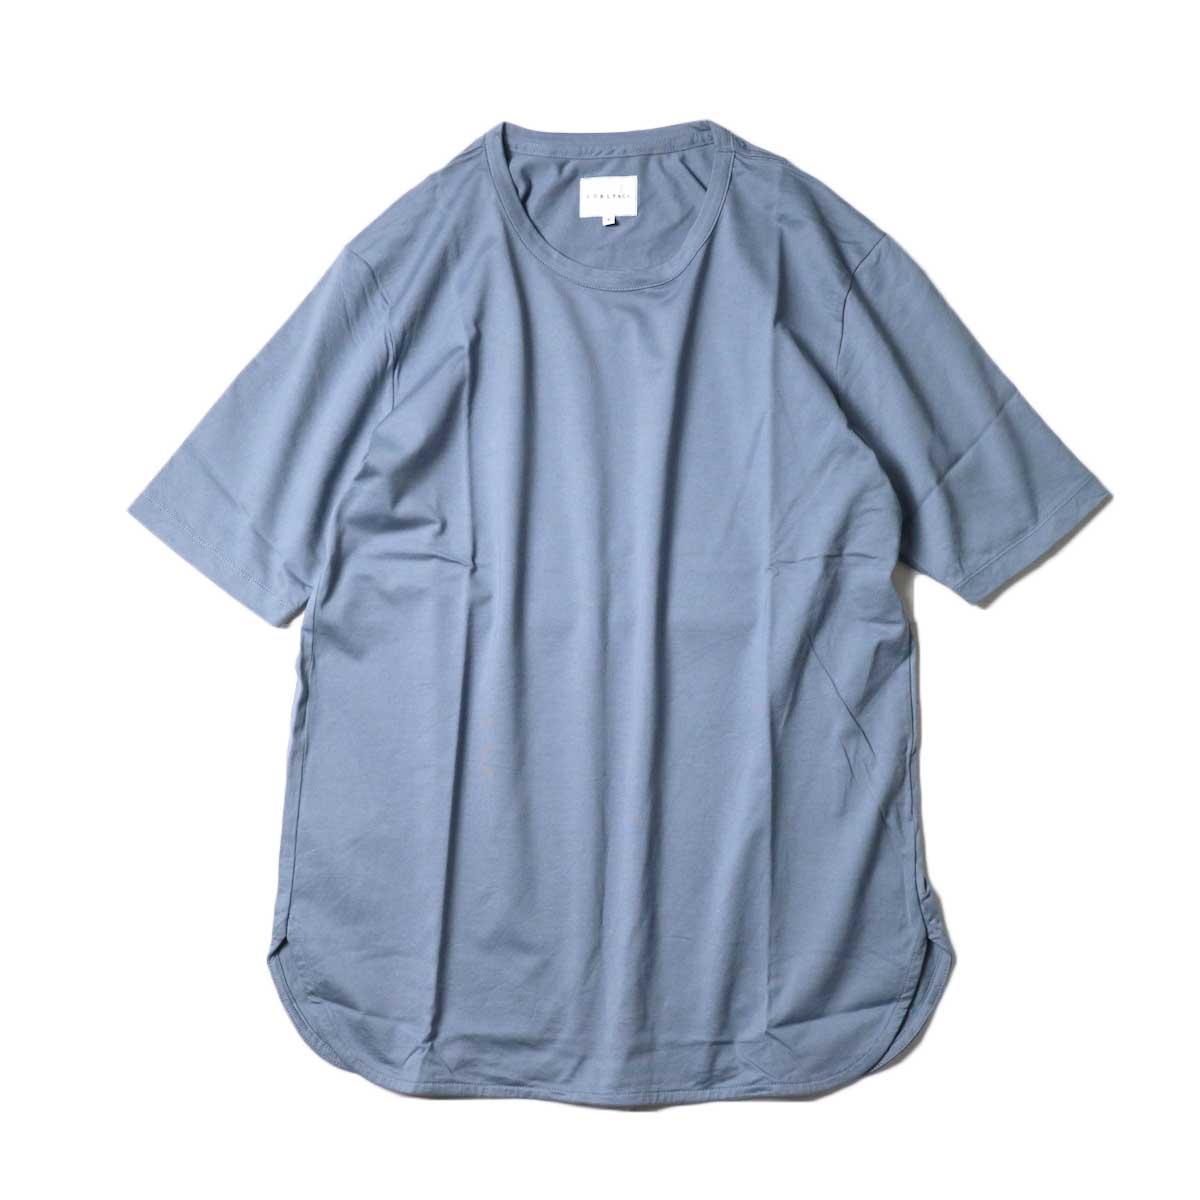 CURLY / SDH L/S CN TEE (Steel Blue)